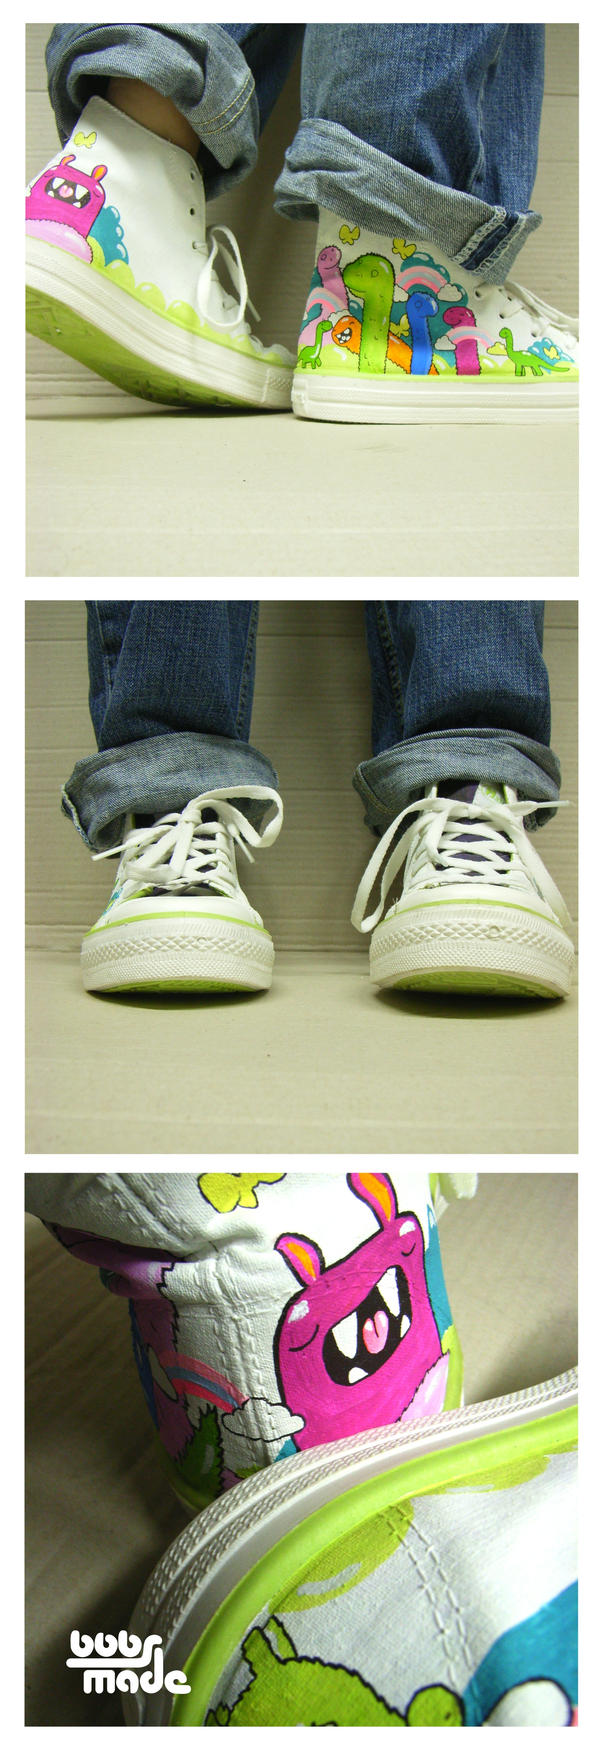 Bobsmade_shoes-Jenny by Bobsmade